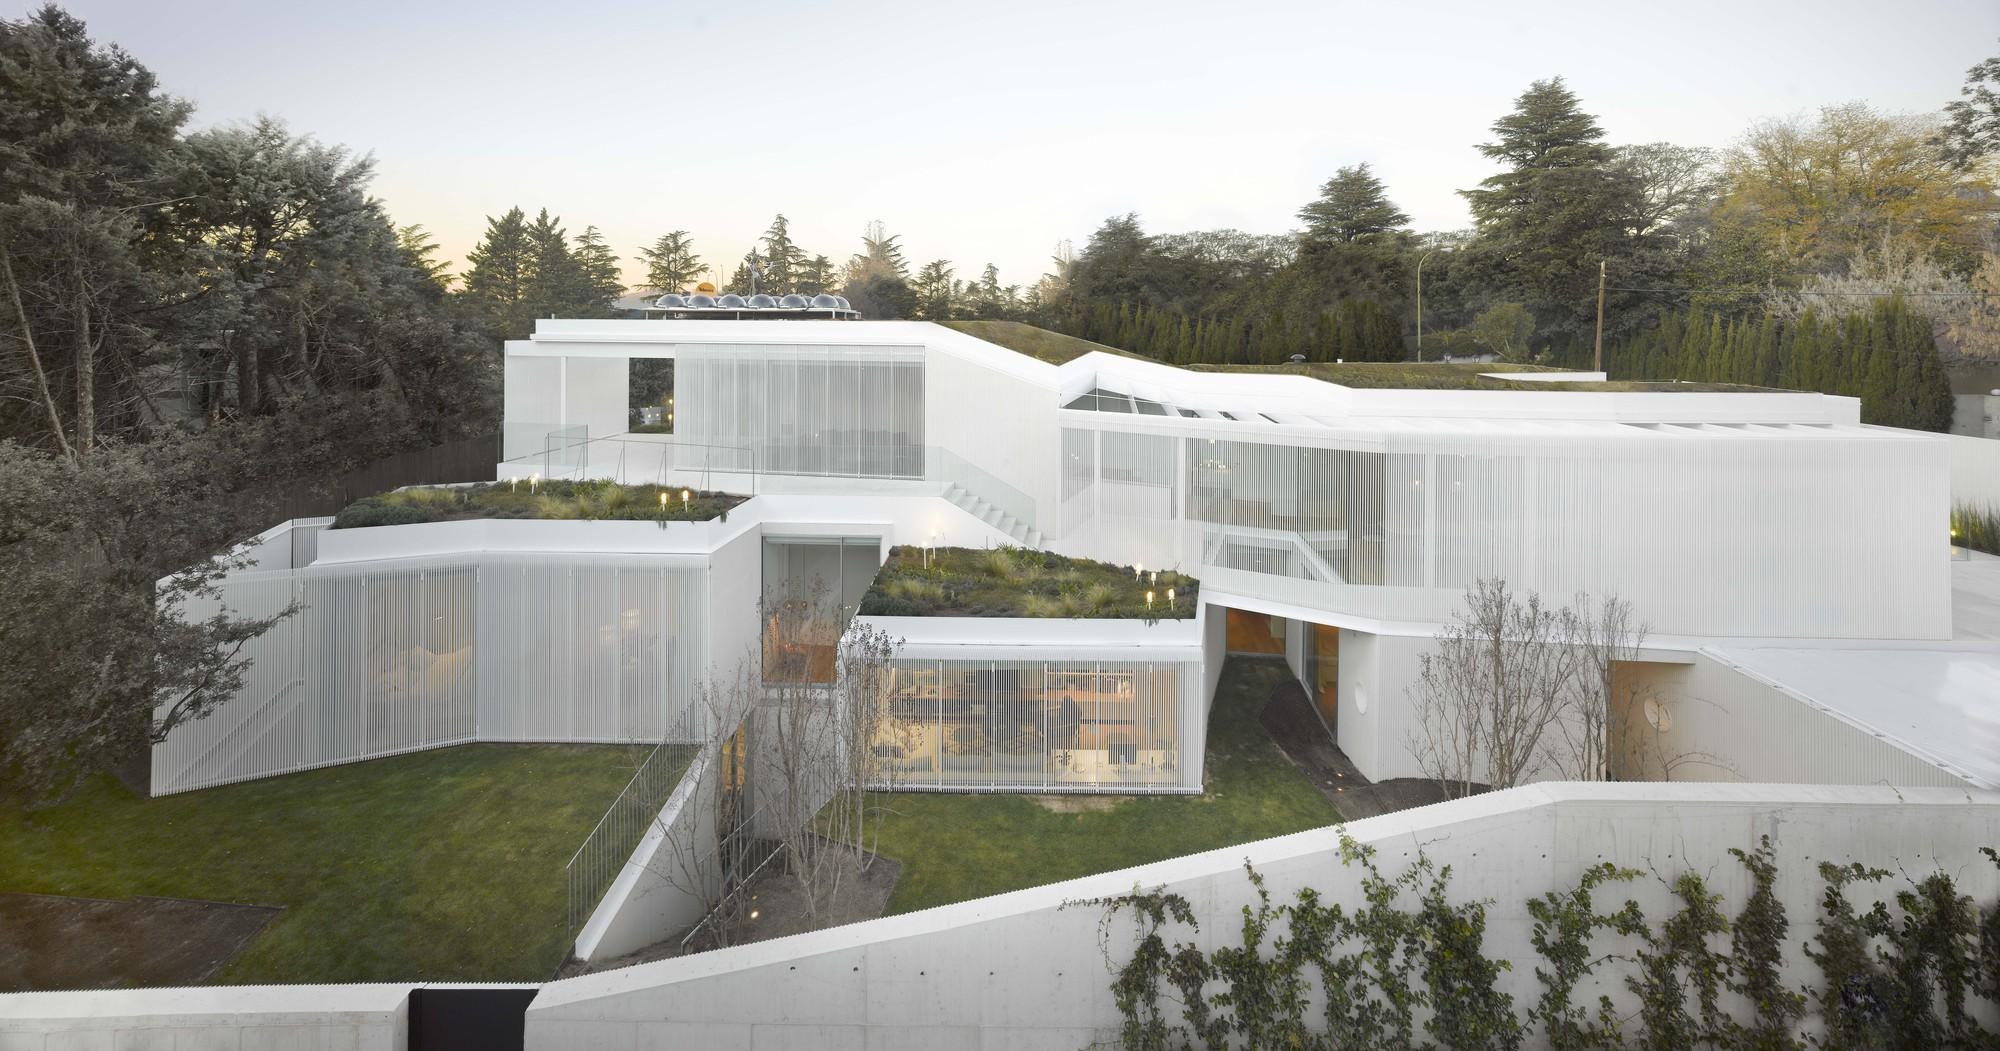 # House # 1.130 / Estudio.Entresitio, © Roland Halbe